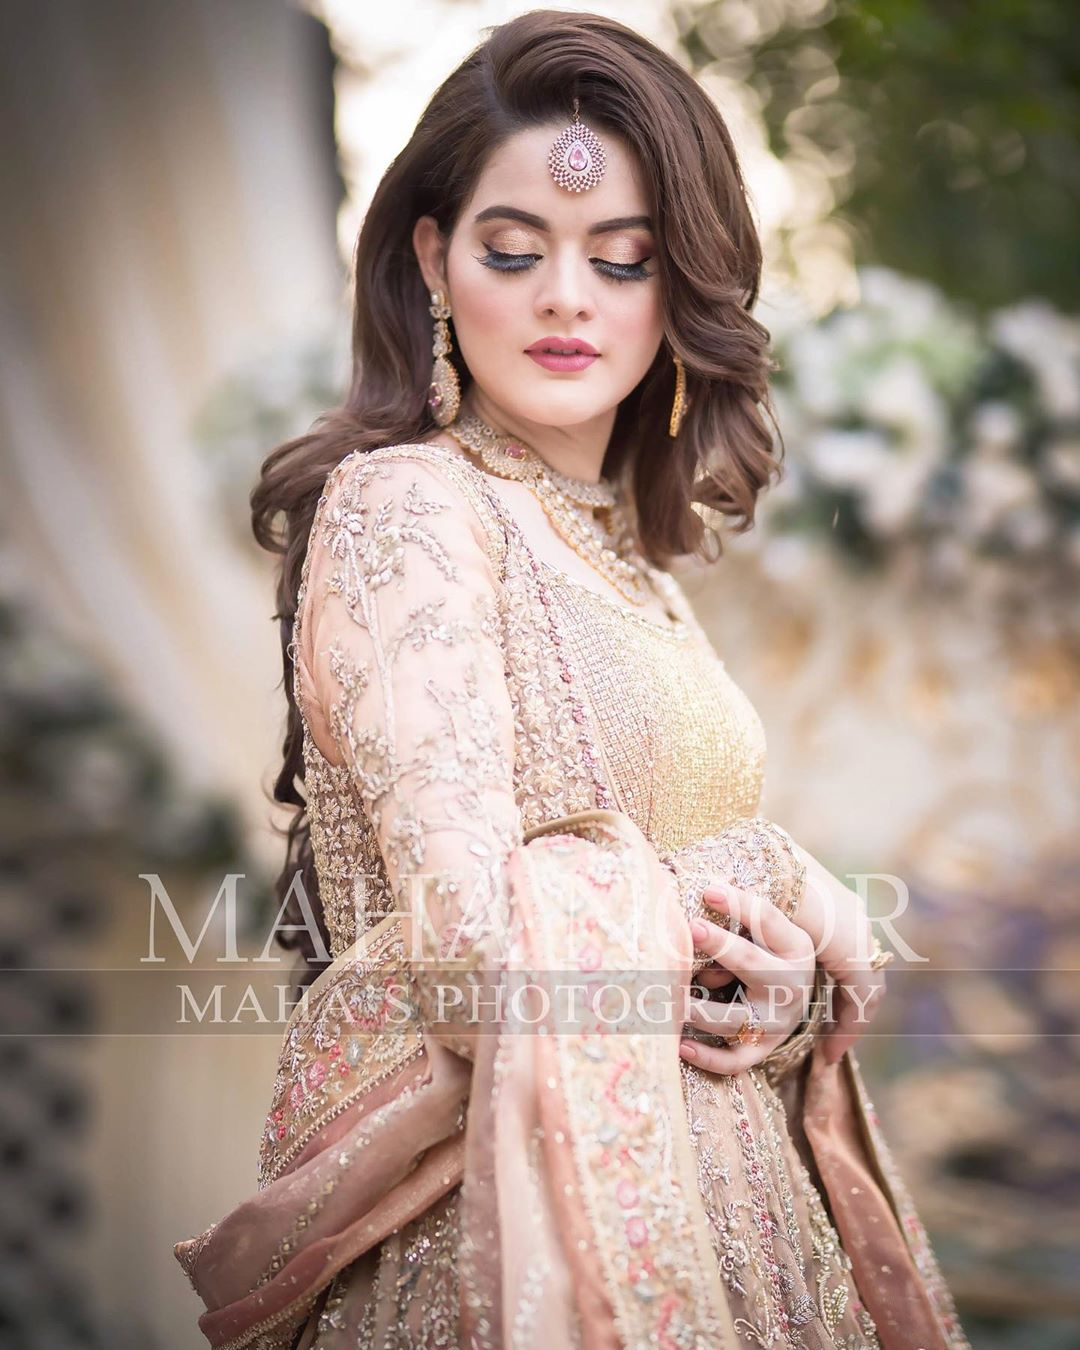 Minal Khan Bridal Photo Shoot 5